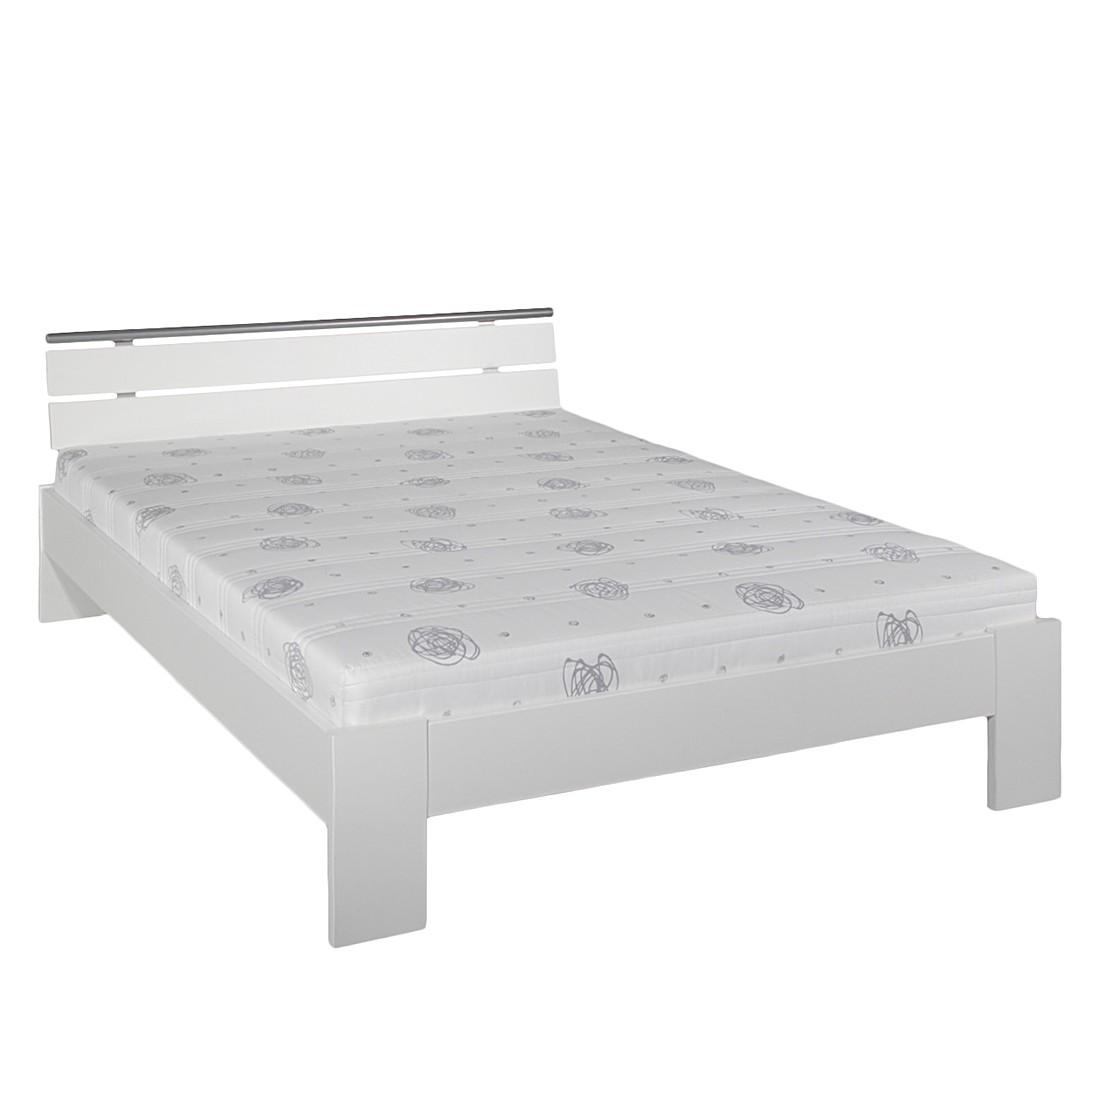 Bett 120x200 Weiss Mit Matratze Bett 120 X 200 Cm Fichte Massiv